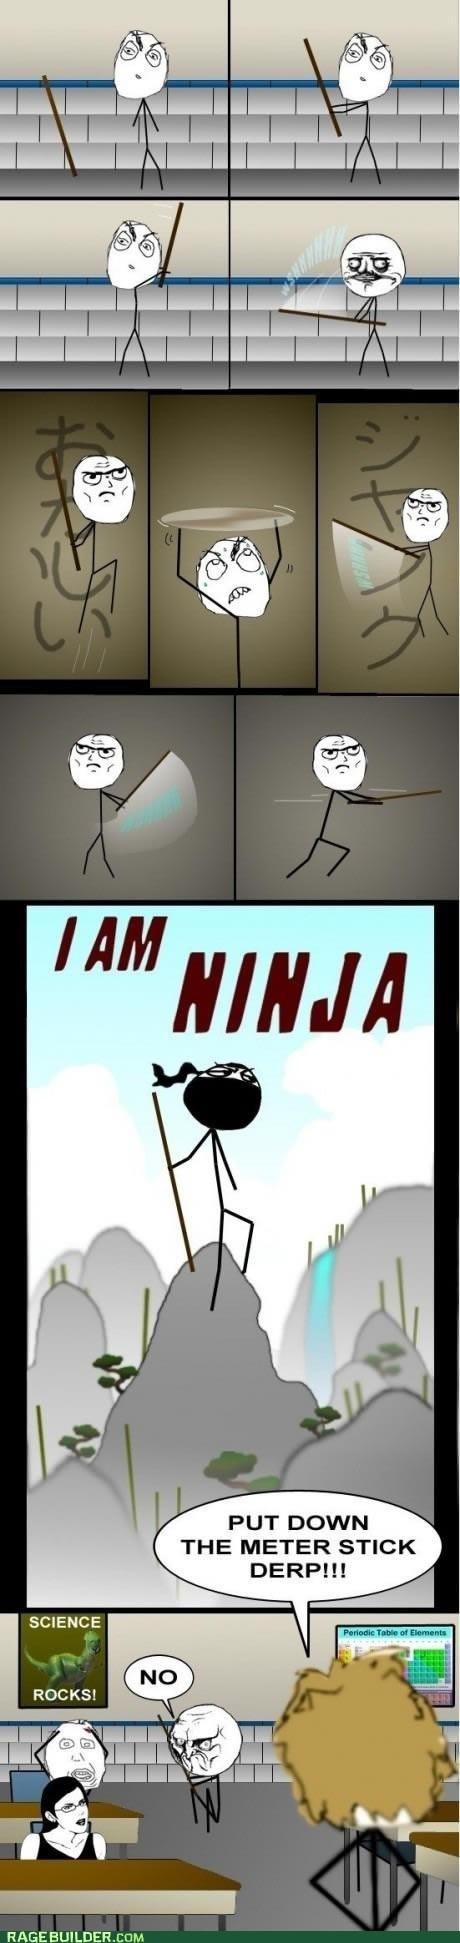 samurai,school,me gusta,ninjas,nunchuks,funny,truancy story,yardsticks